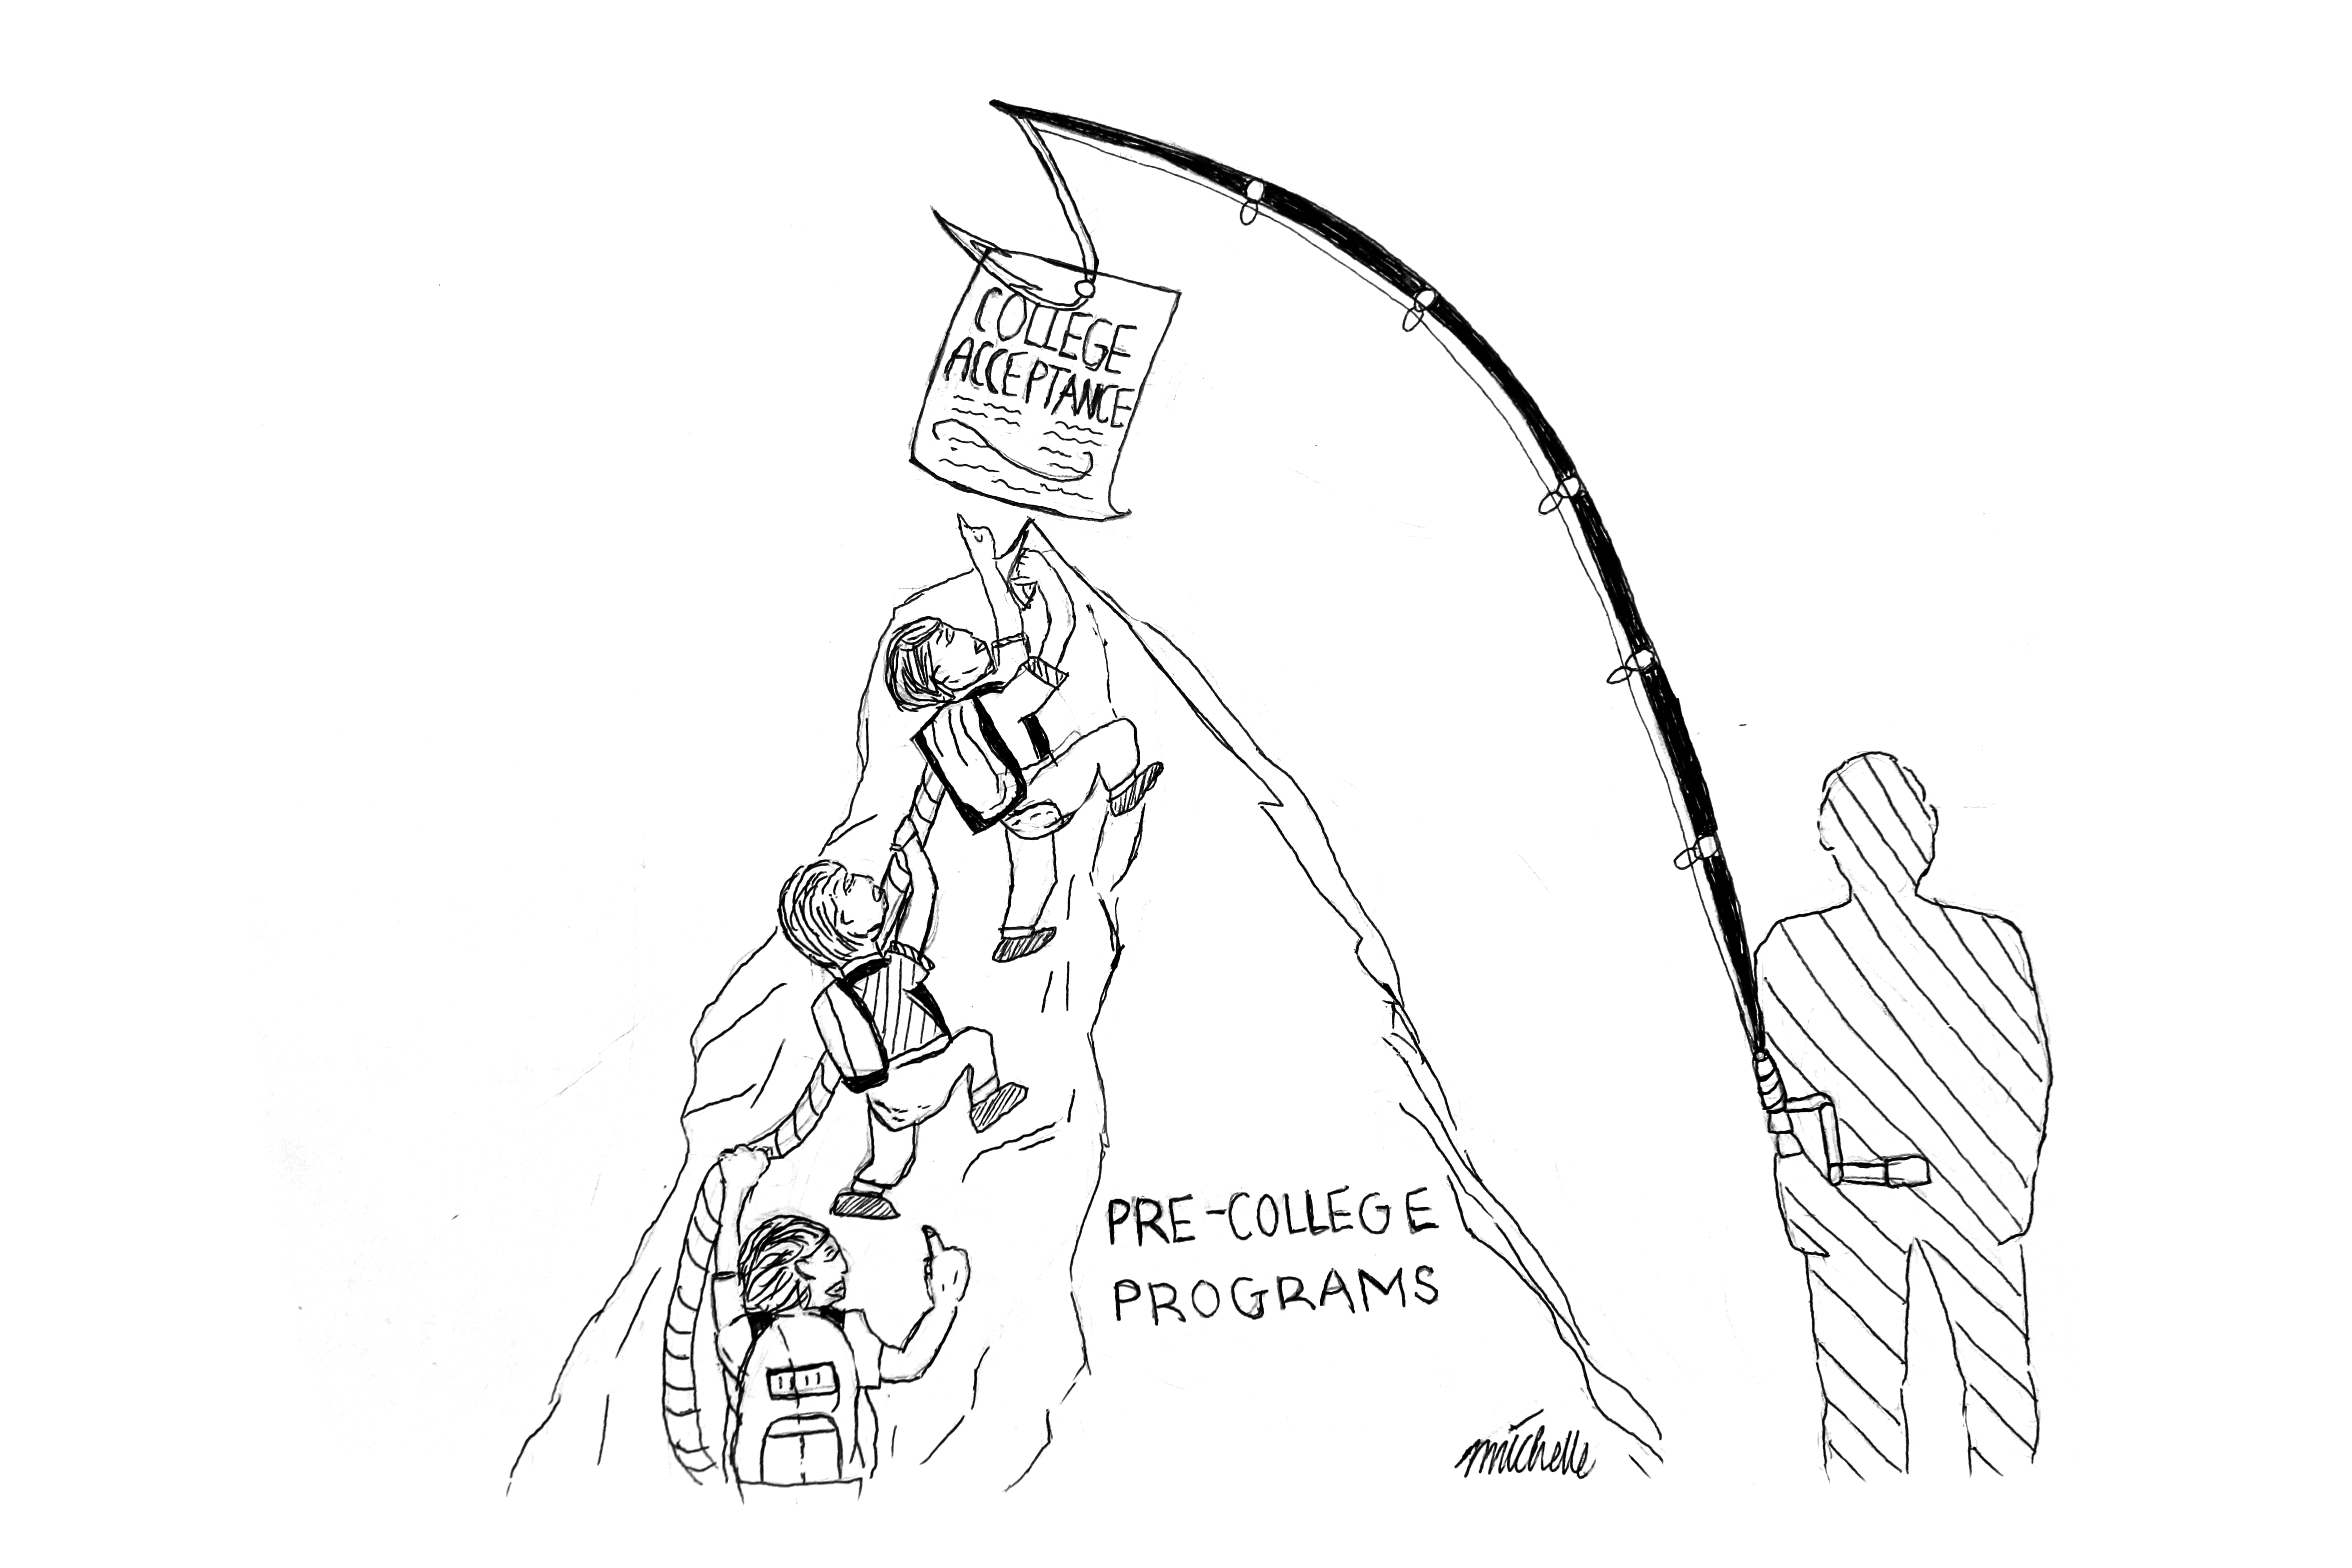 Pre-college programs make no guarantees